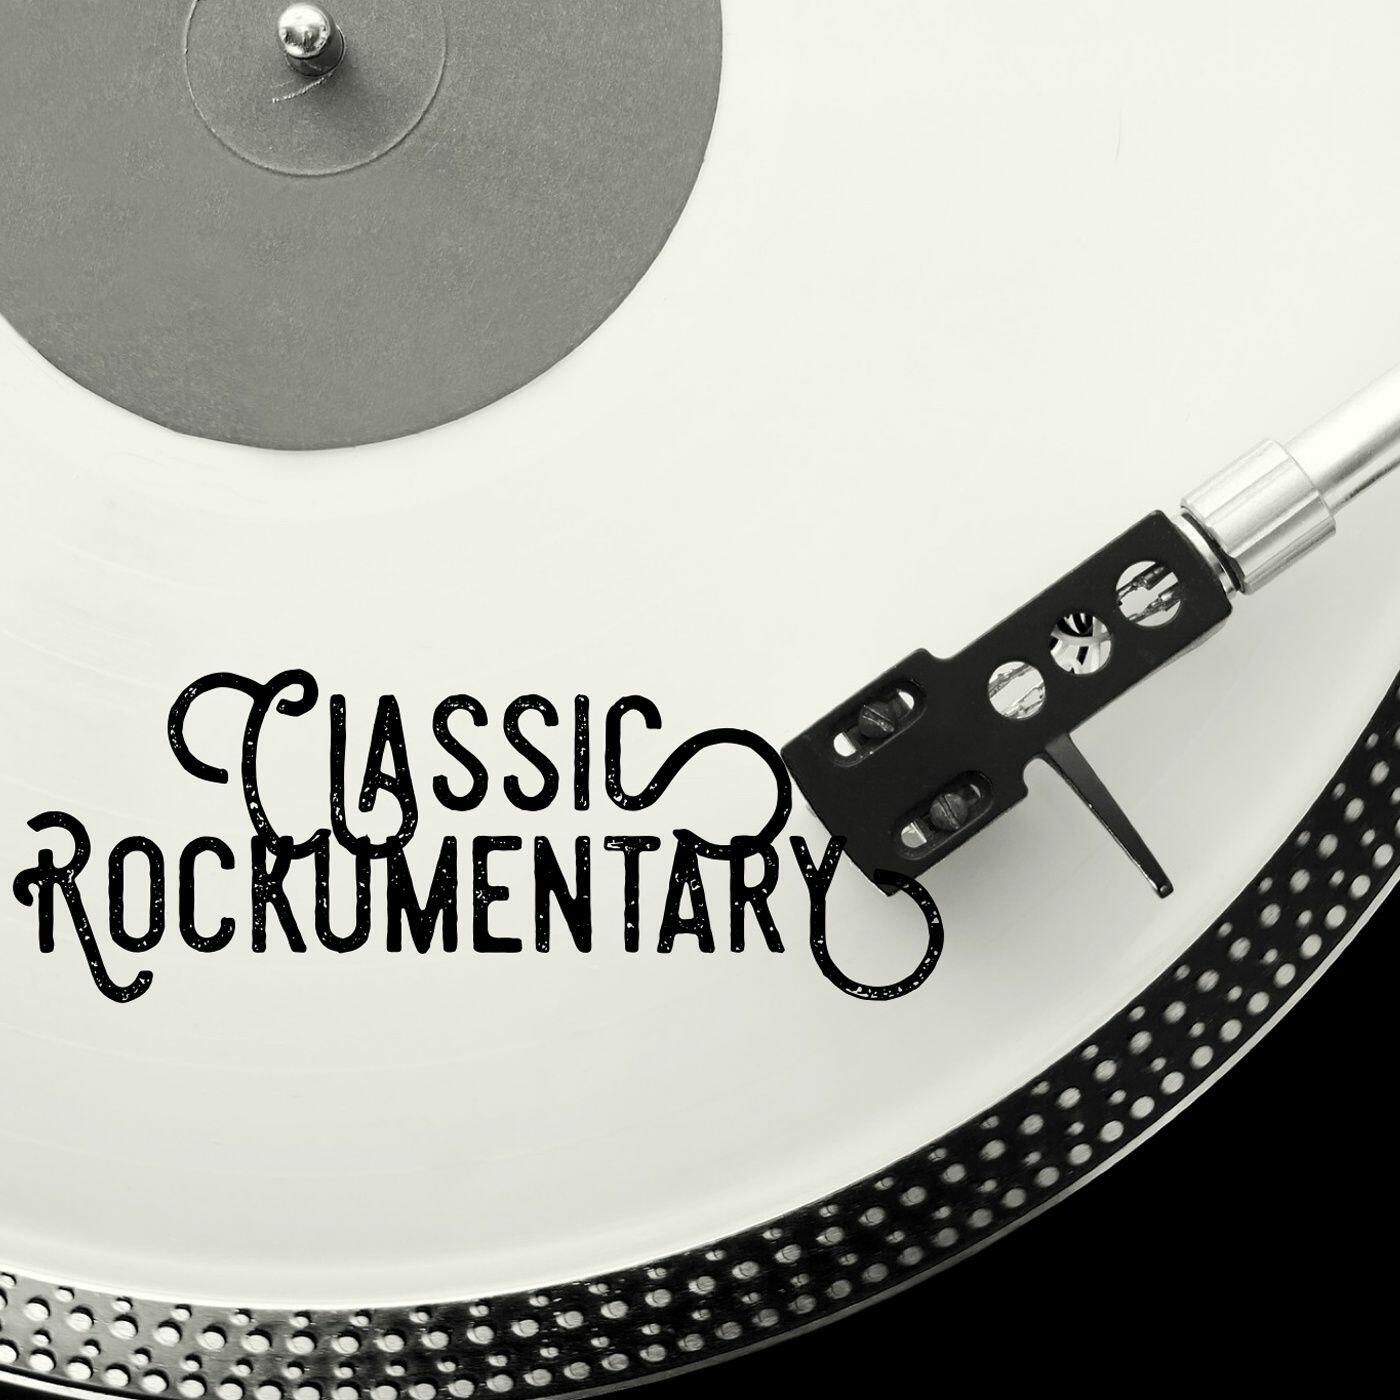 Classic Rockumentary